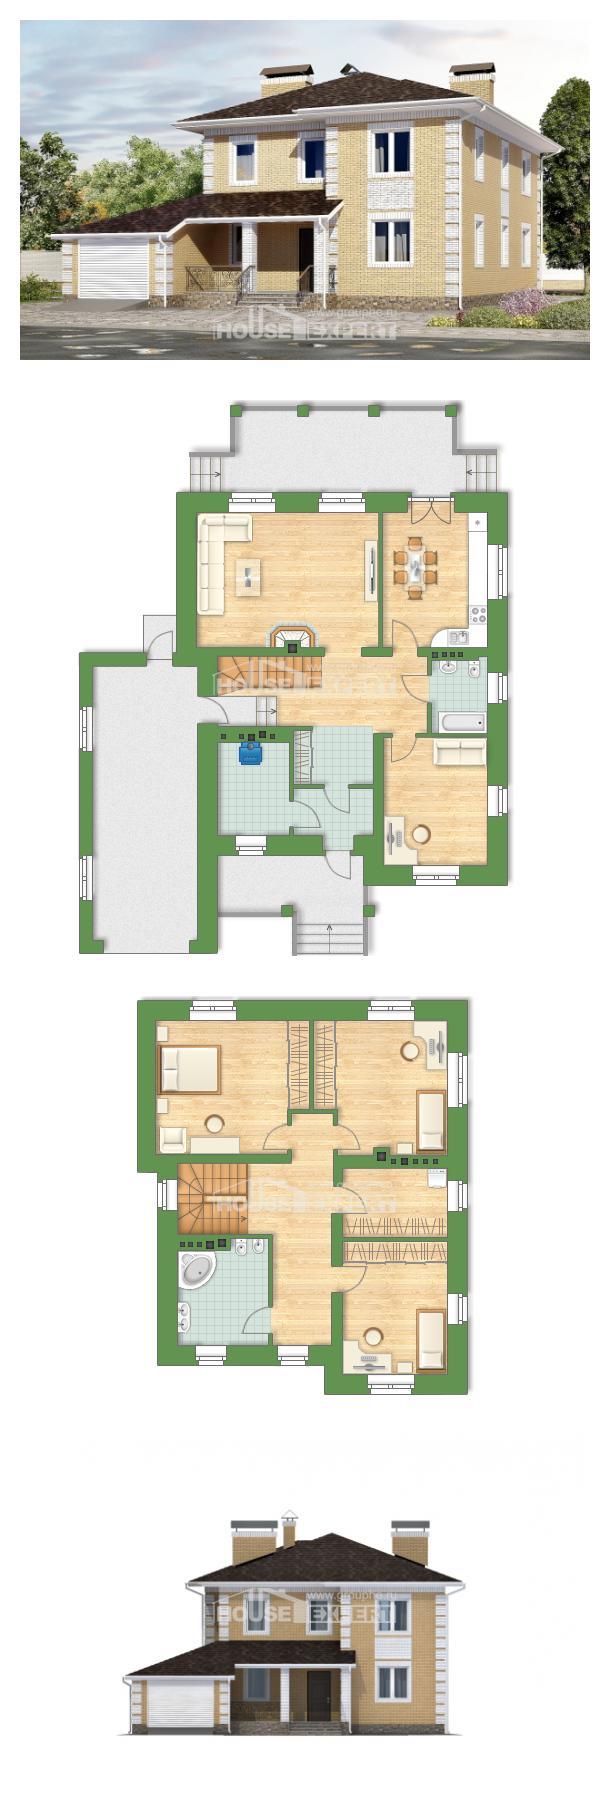 Проект дома 220-006-Л   House Expert